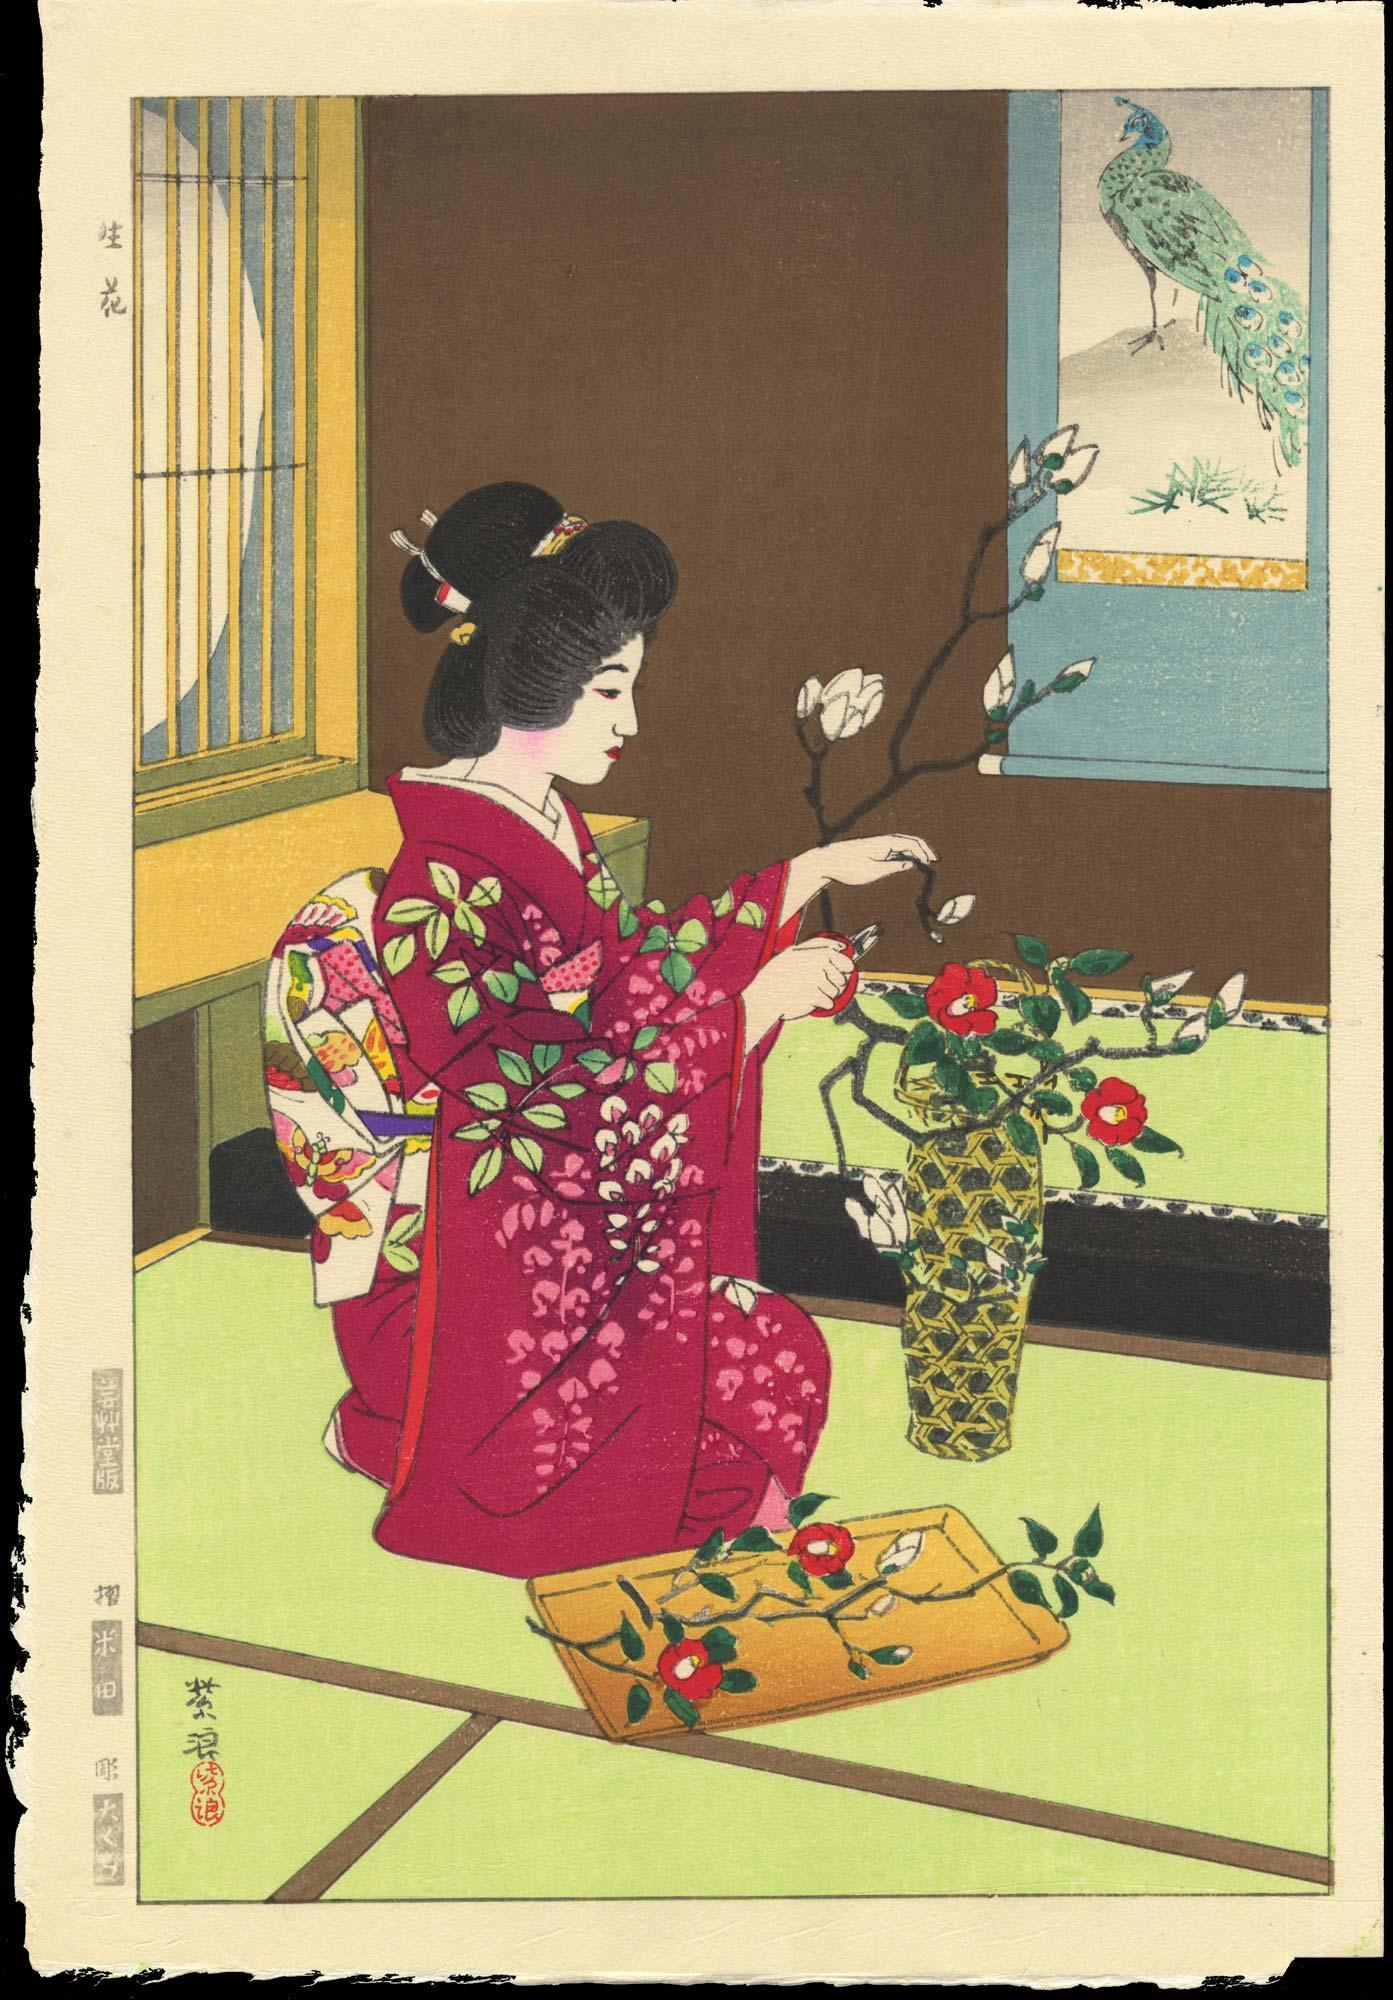 Kasamatsu Shiro Ikebana Flower Arranging Ohmi Gallery